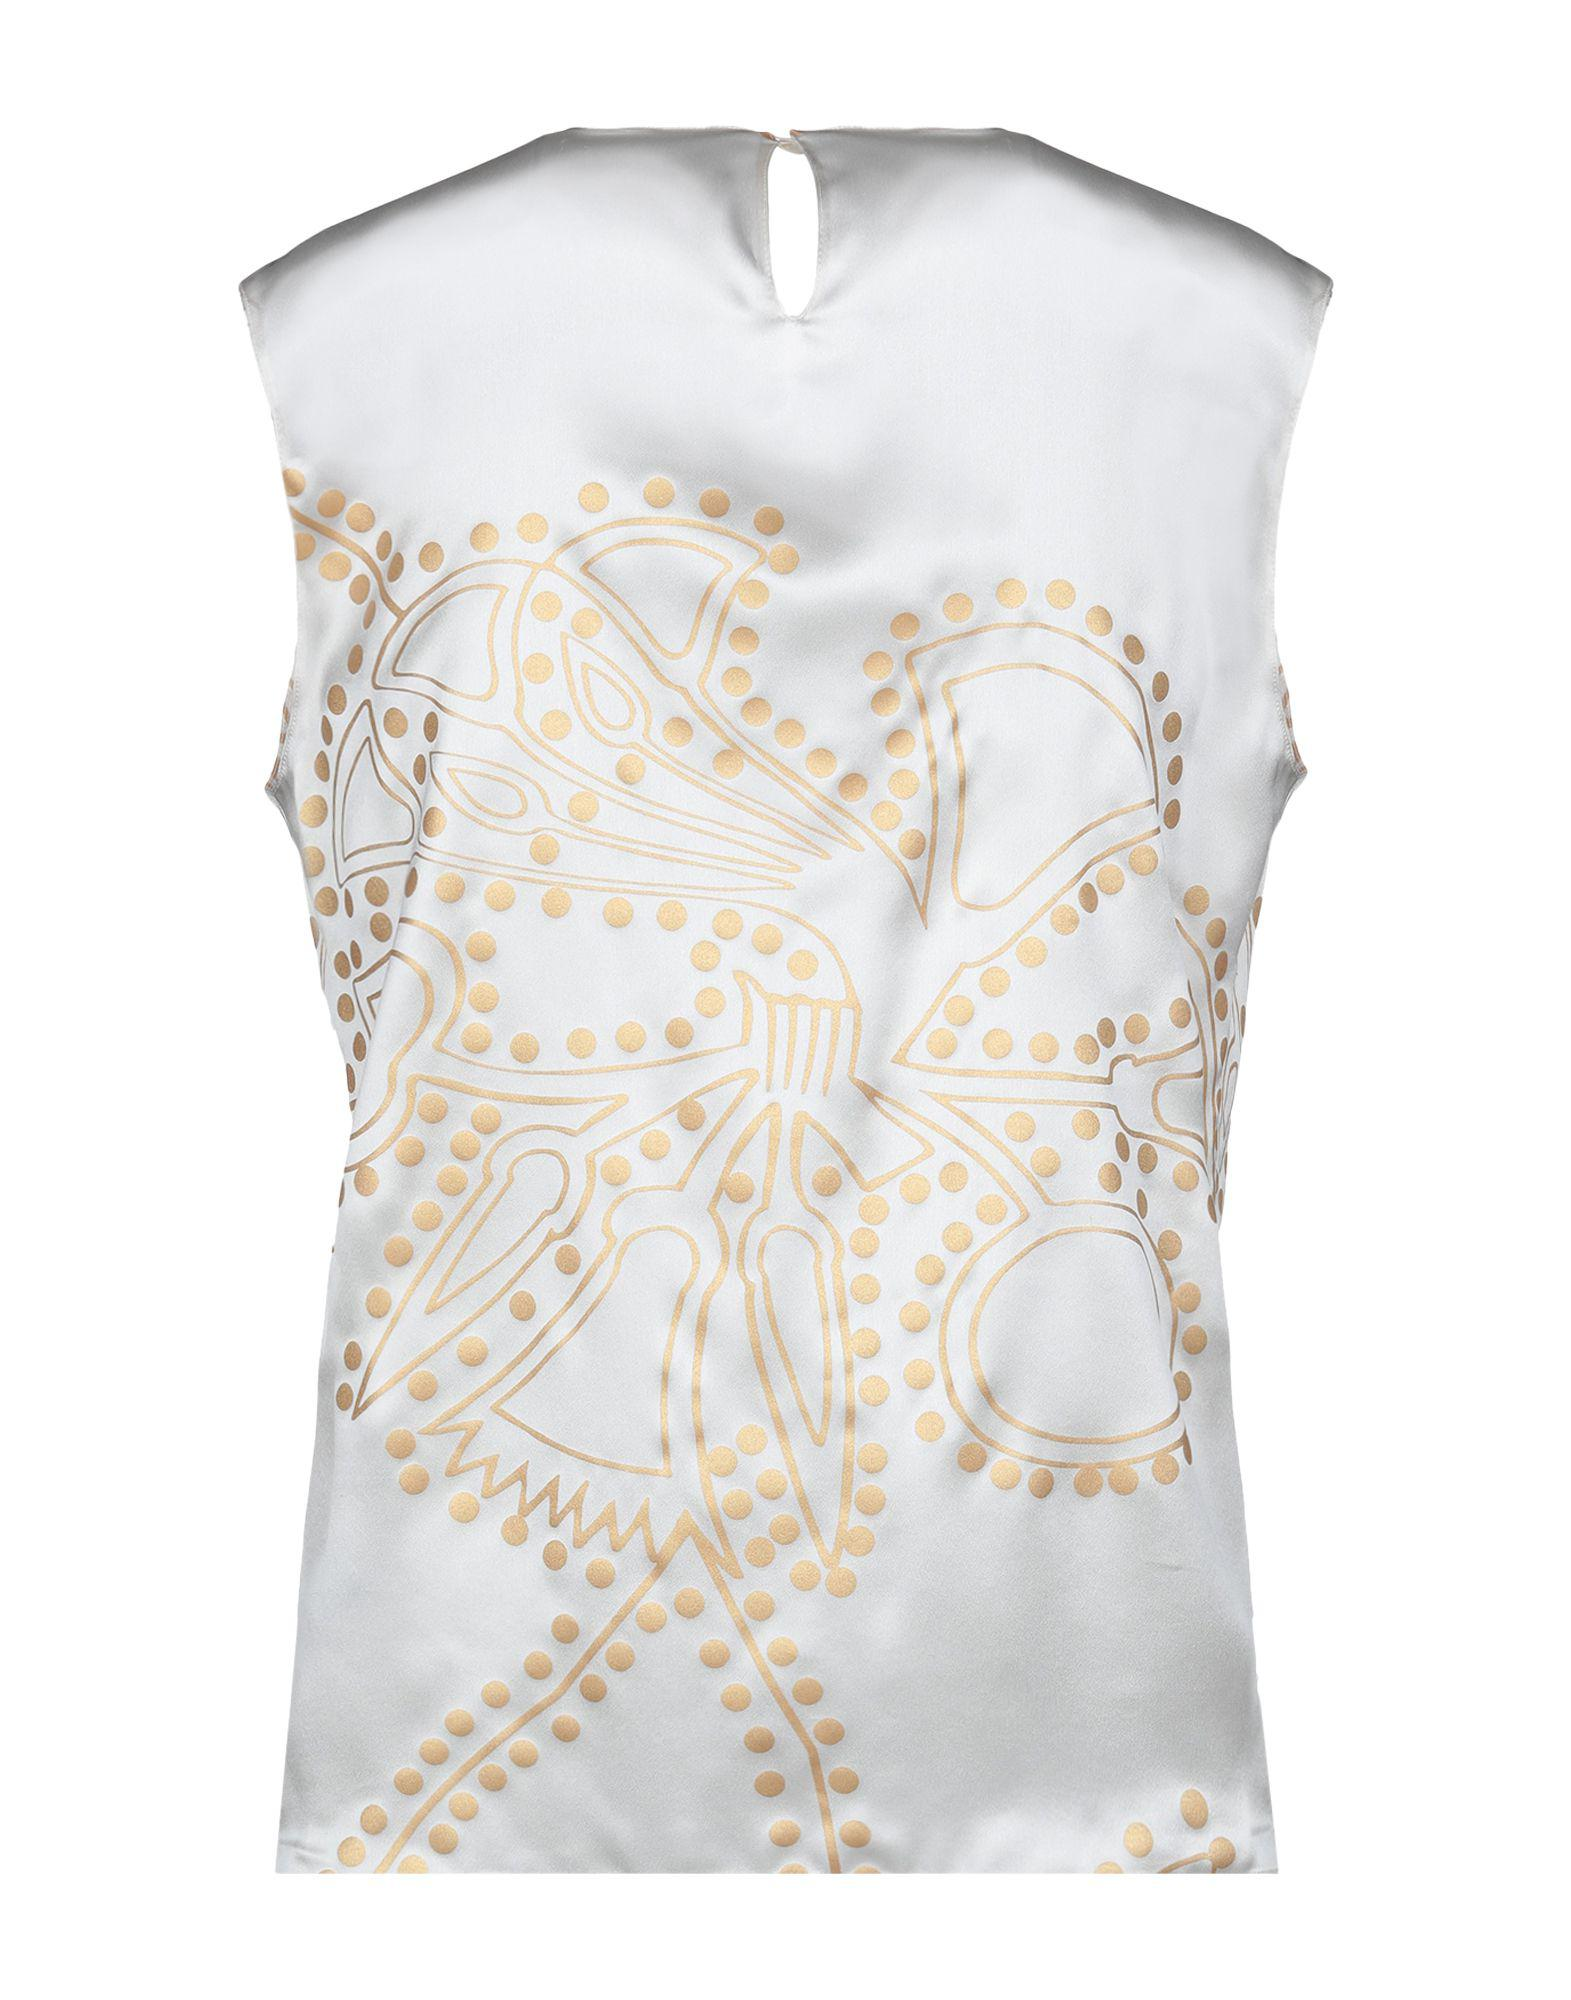 the latest f624d 56506 Agnona Top in White - Lyst